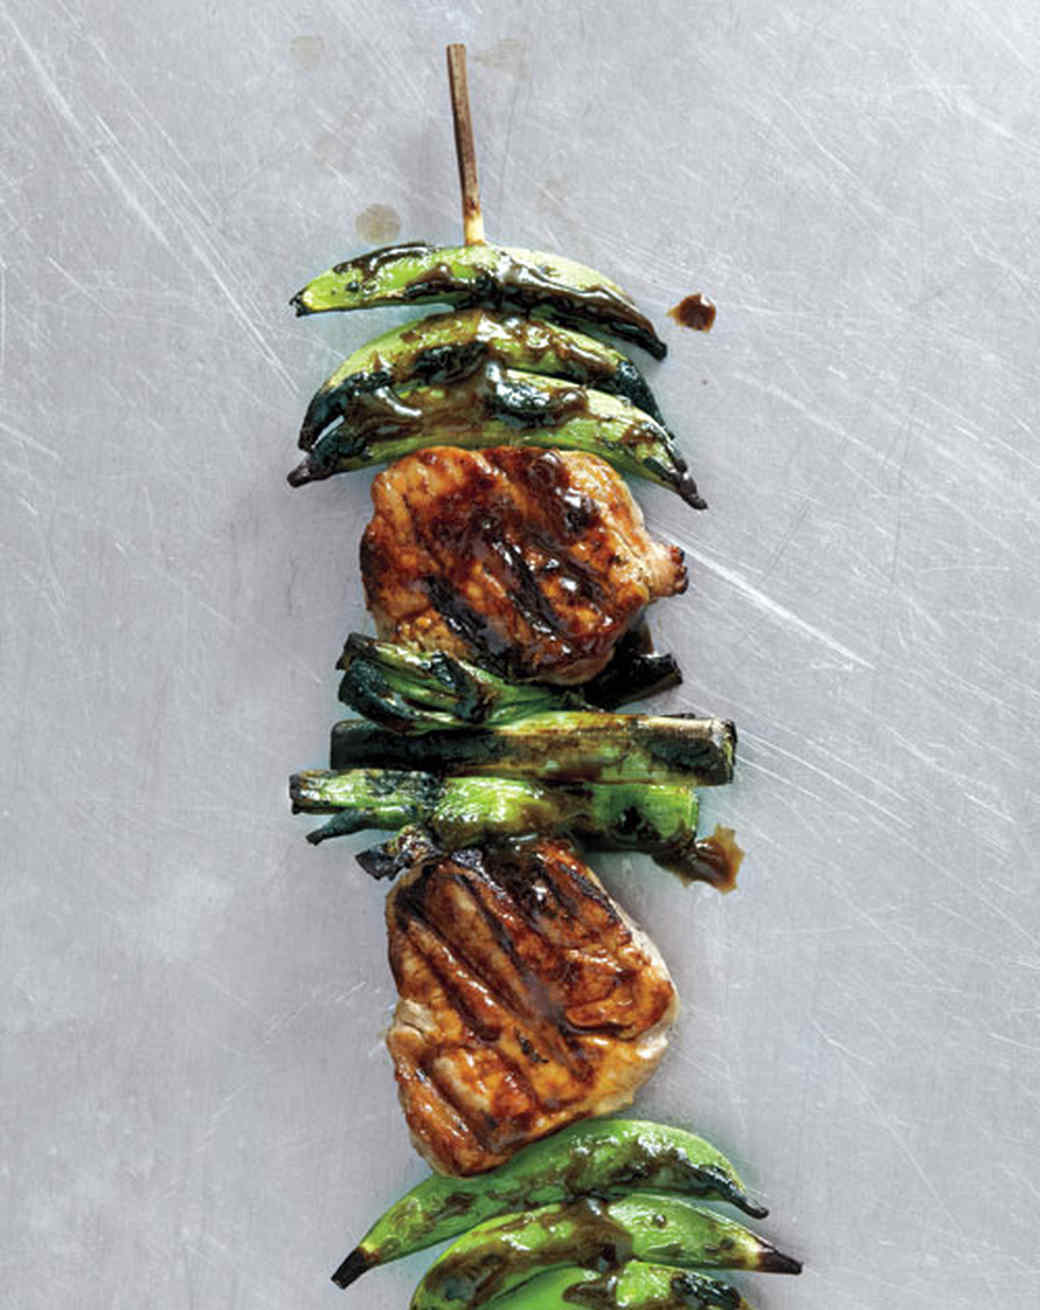 Pork and Snap Pea Kebabs with Ginger-Hoisin Glaze